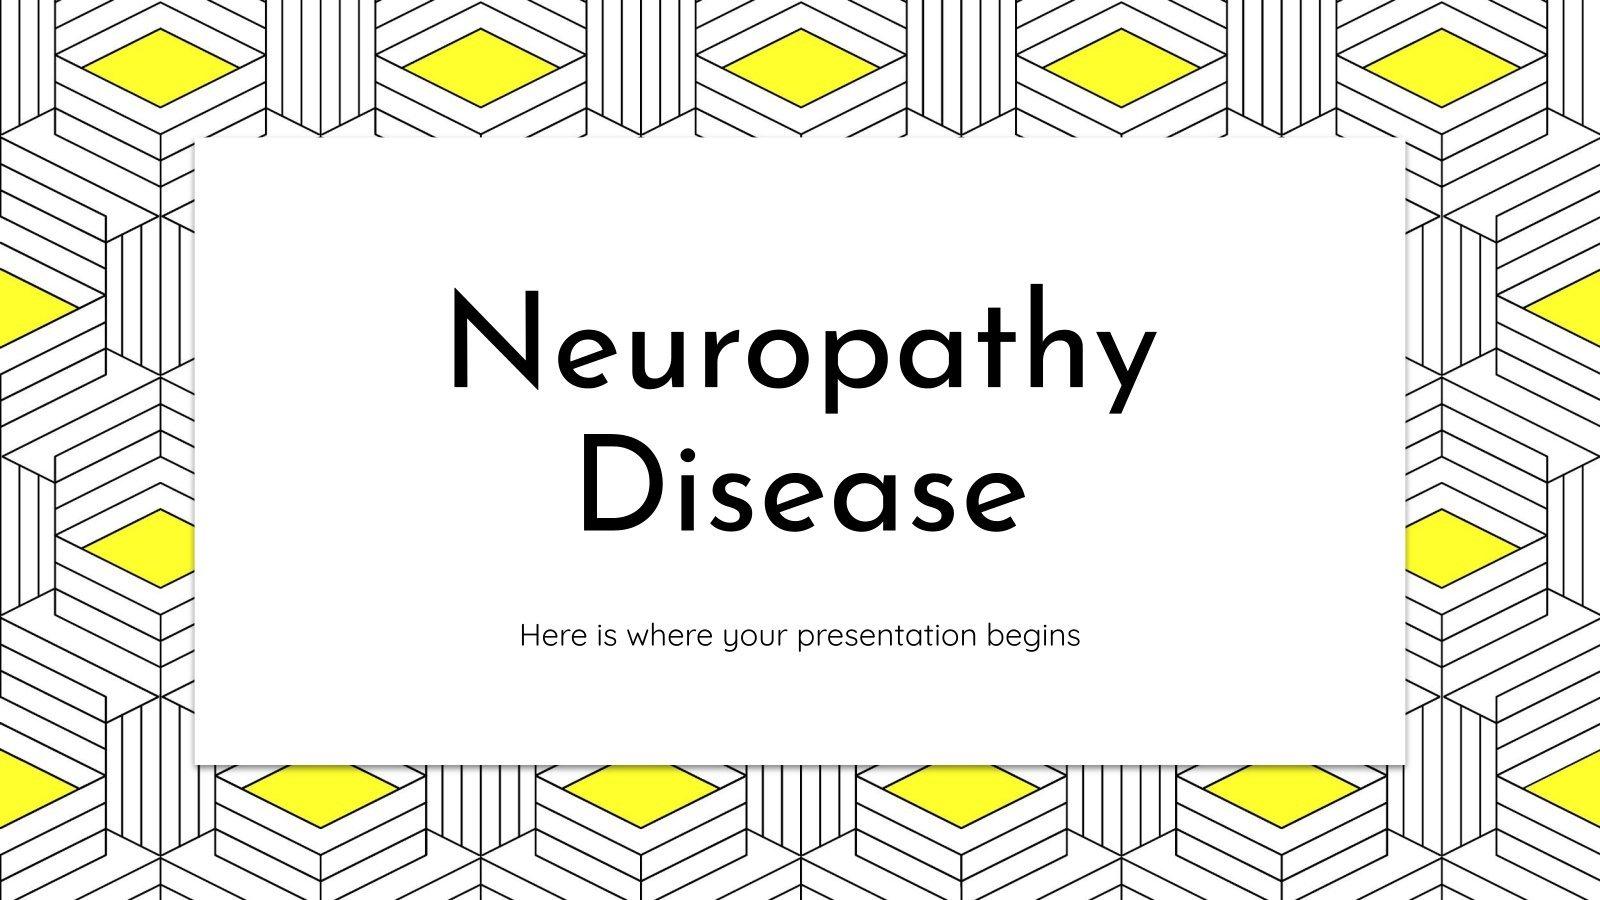 Neuropathy Disease presentation template